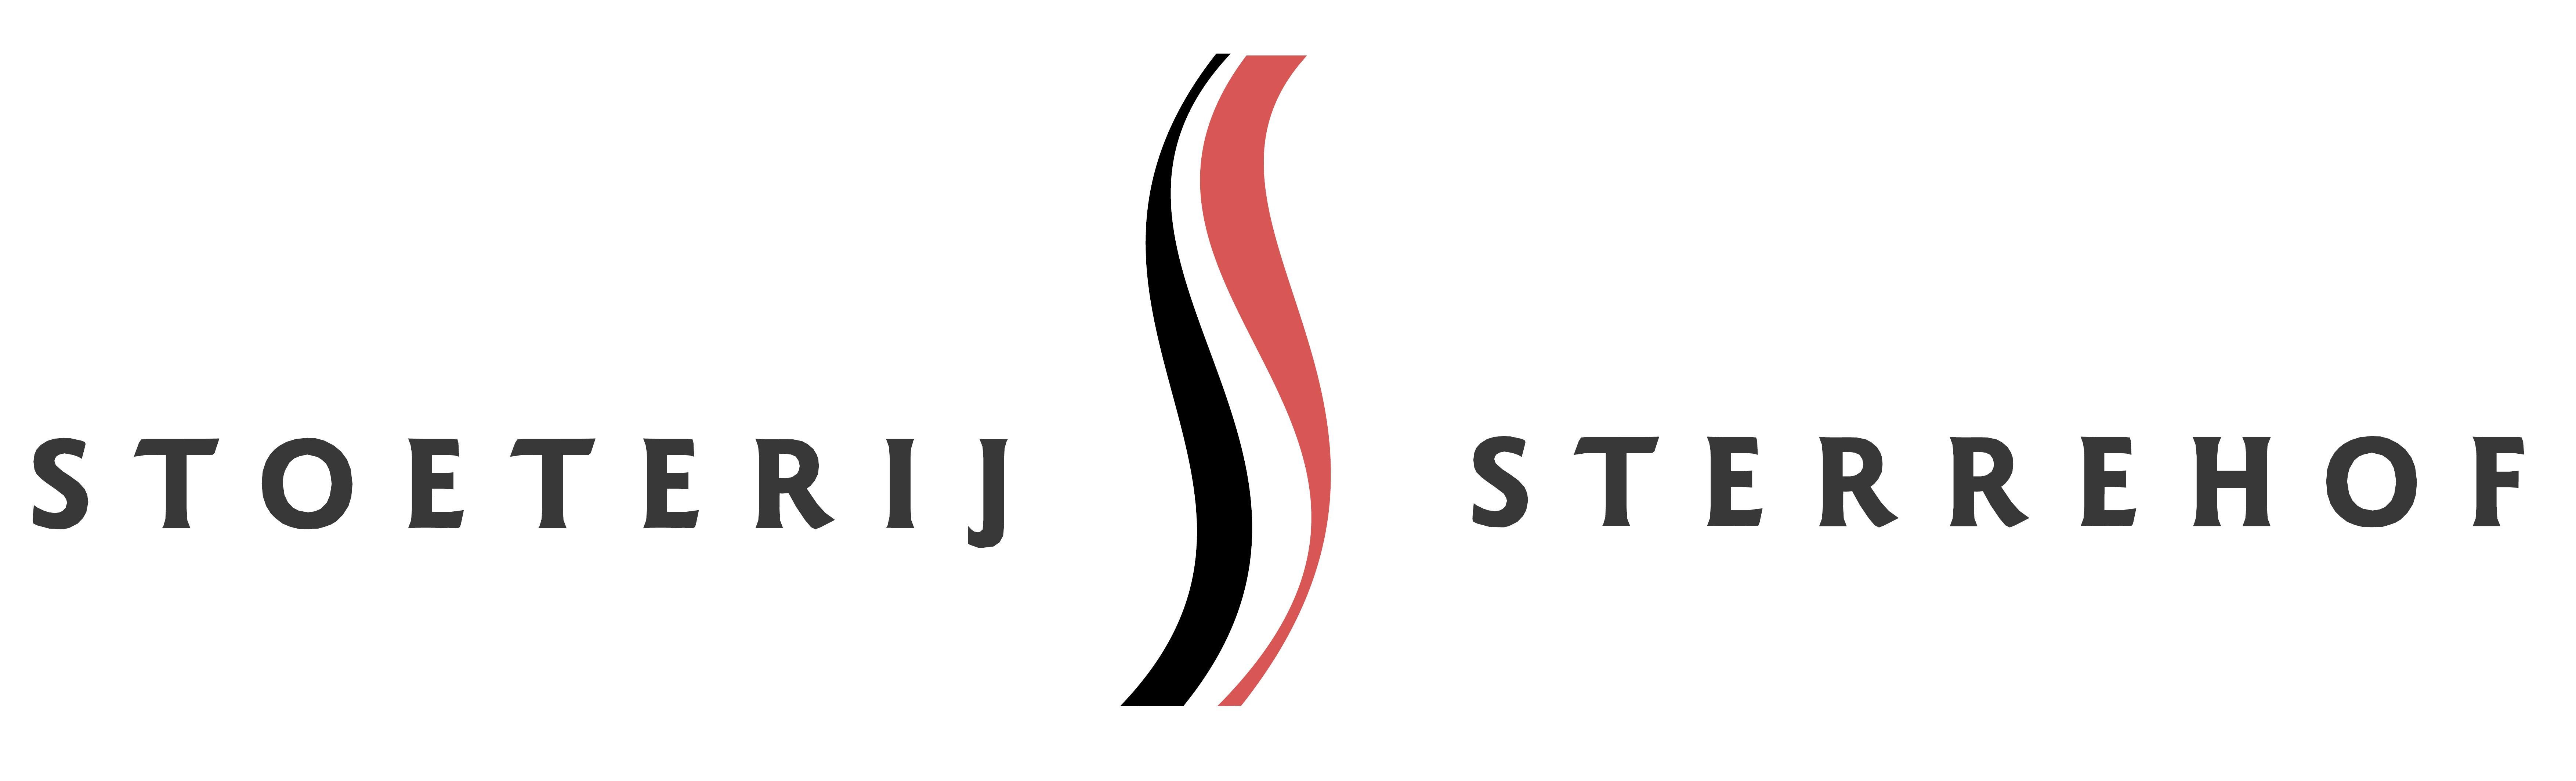 logo stoeterij sterrehof